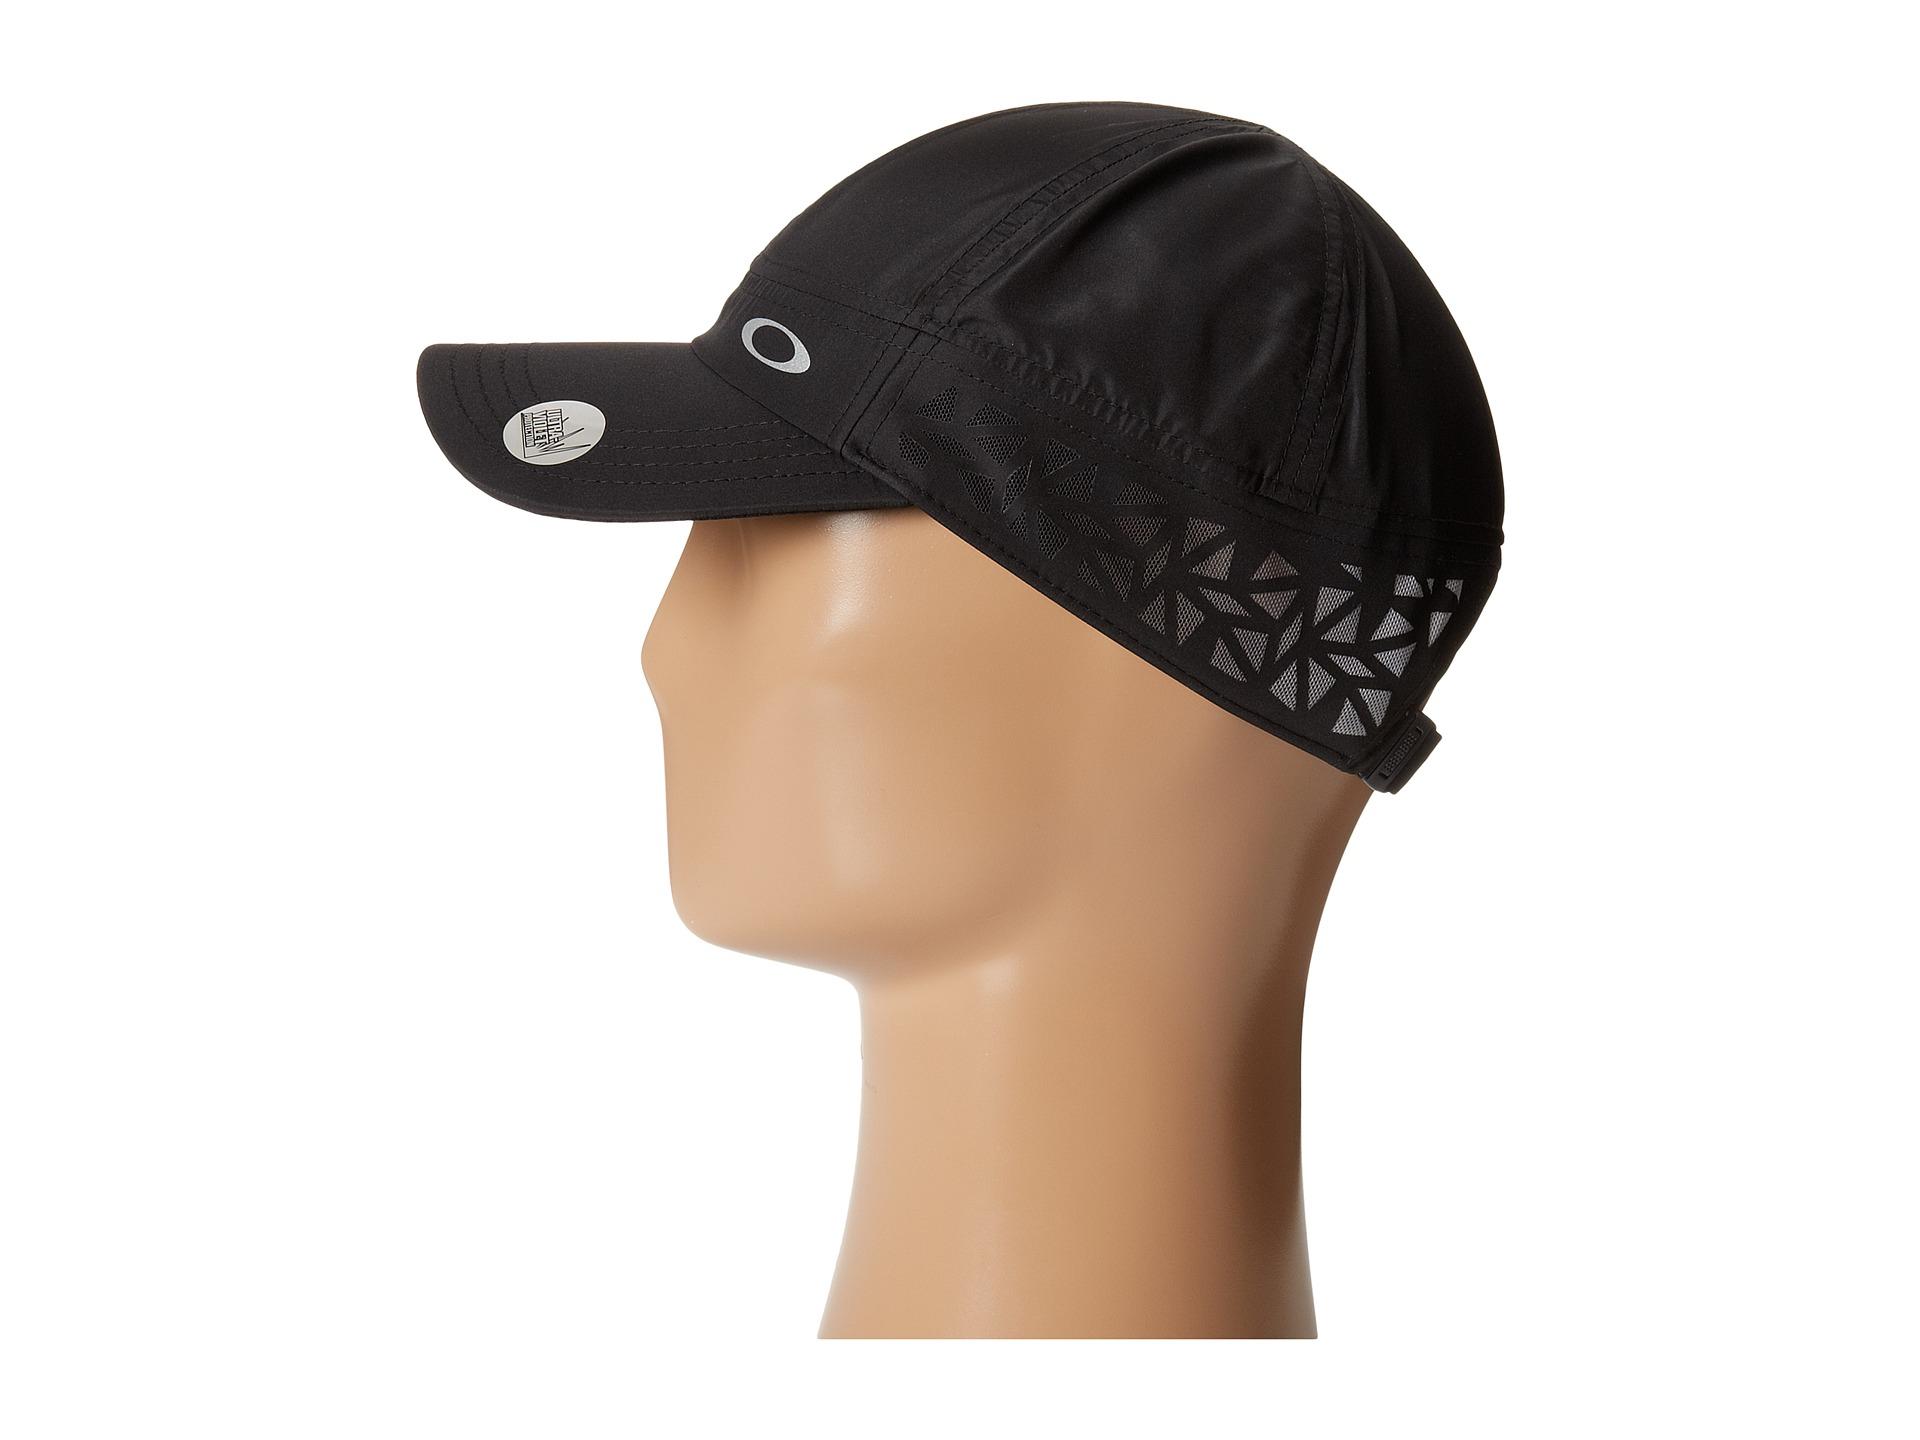 9068c8511255c ... canada lyst oakley performance running hat in black 8a948 09aae